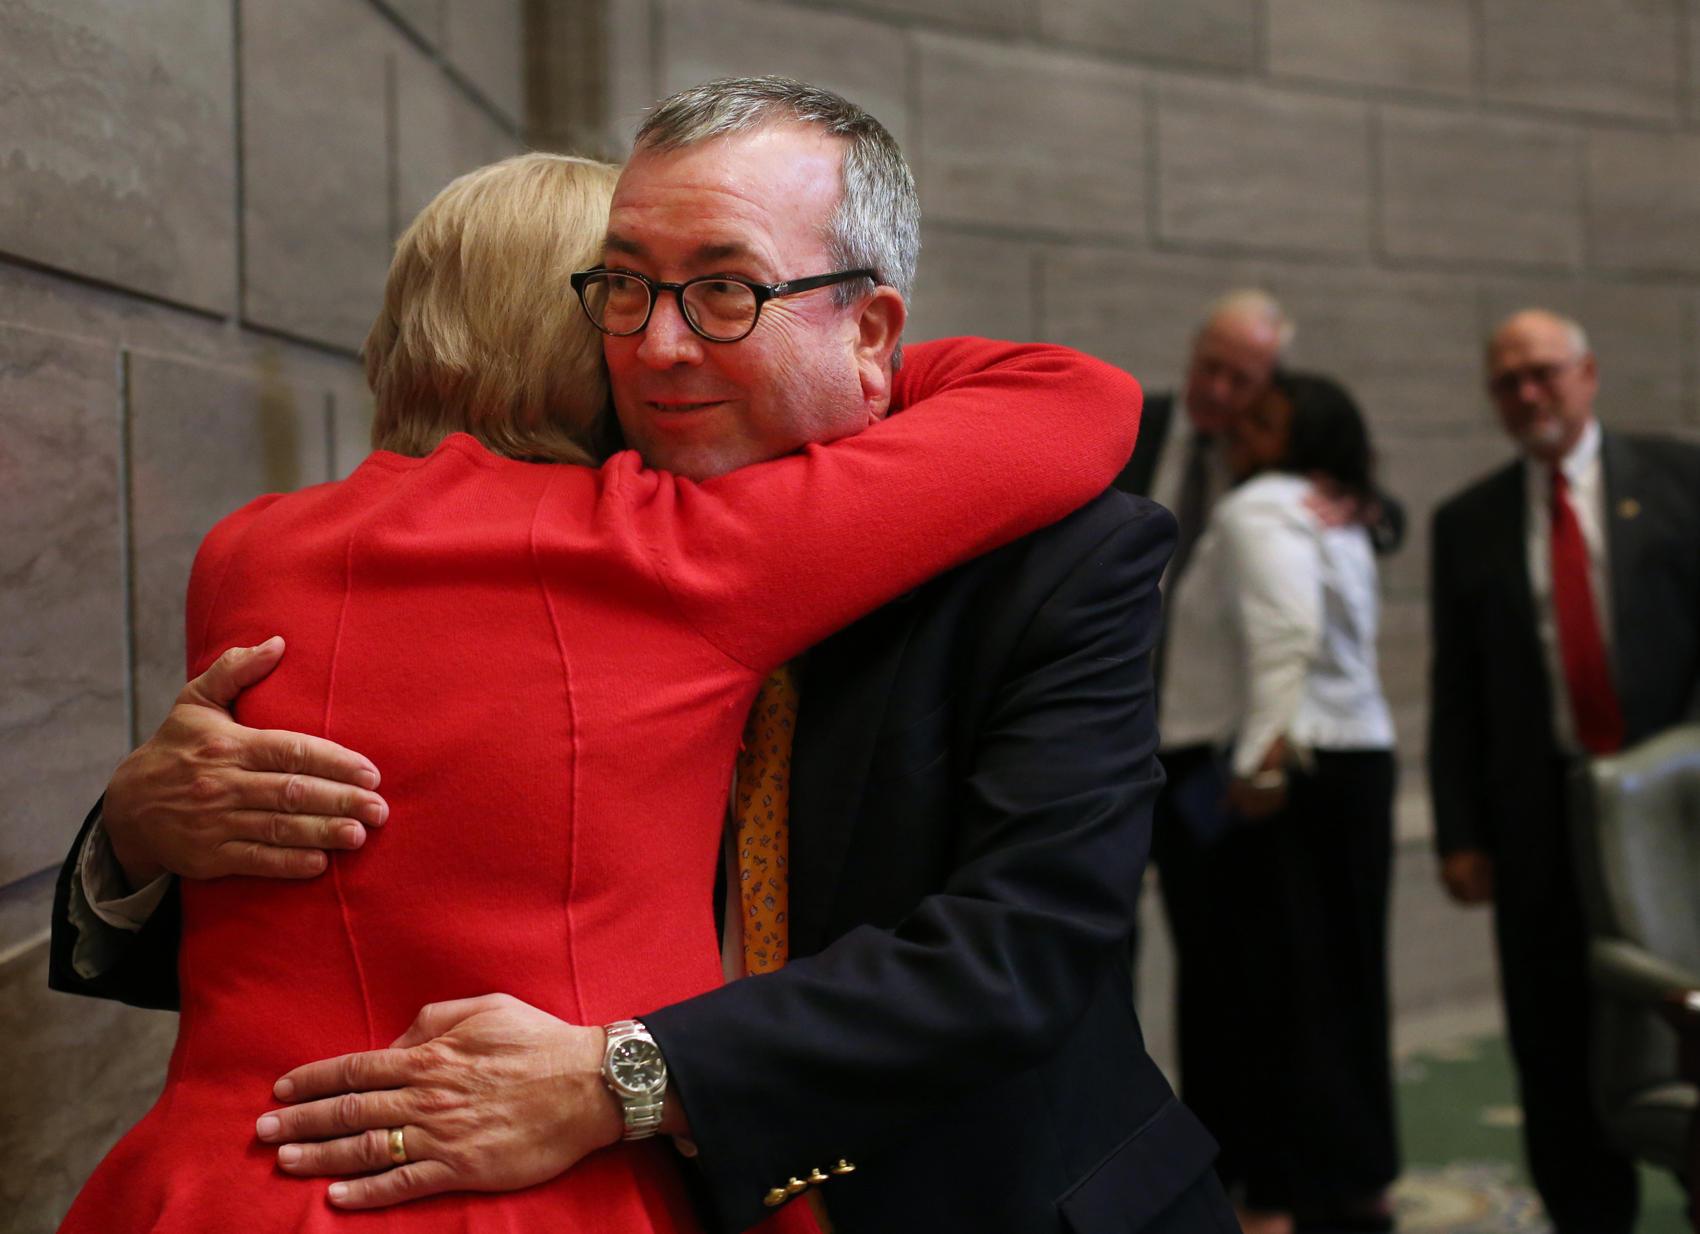 Democratic Committee Members Nominate Hummel To Replace Keaveny In Missouri Judges 2010 General Election November 2nd Senate